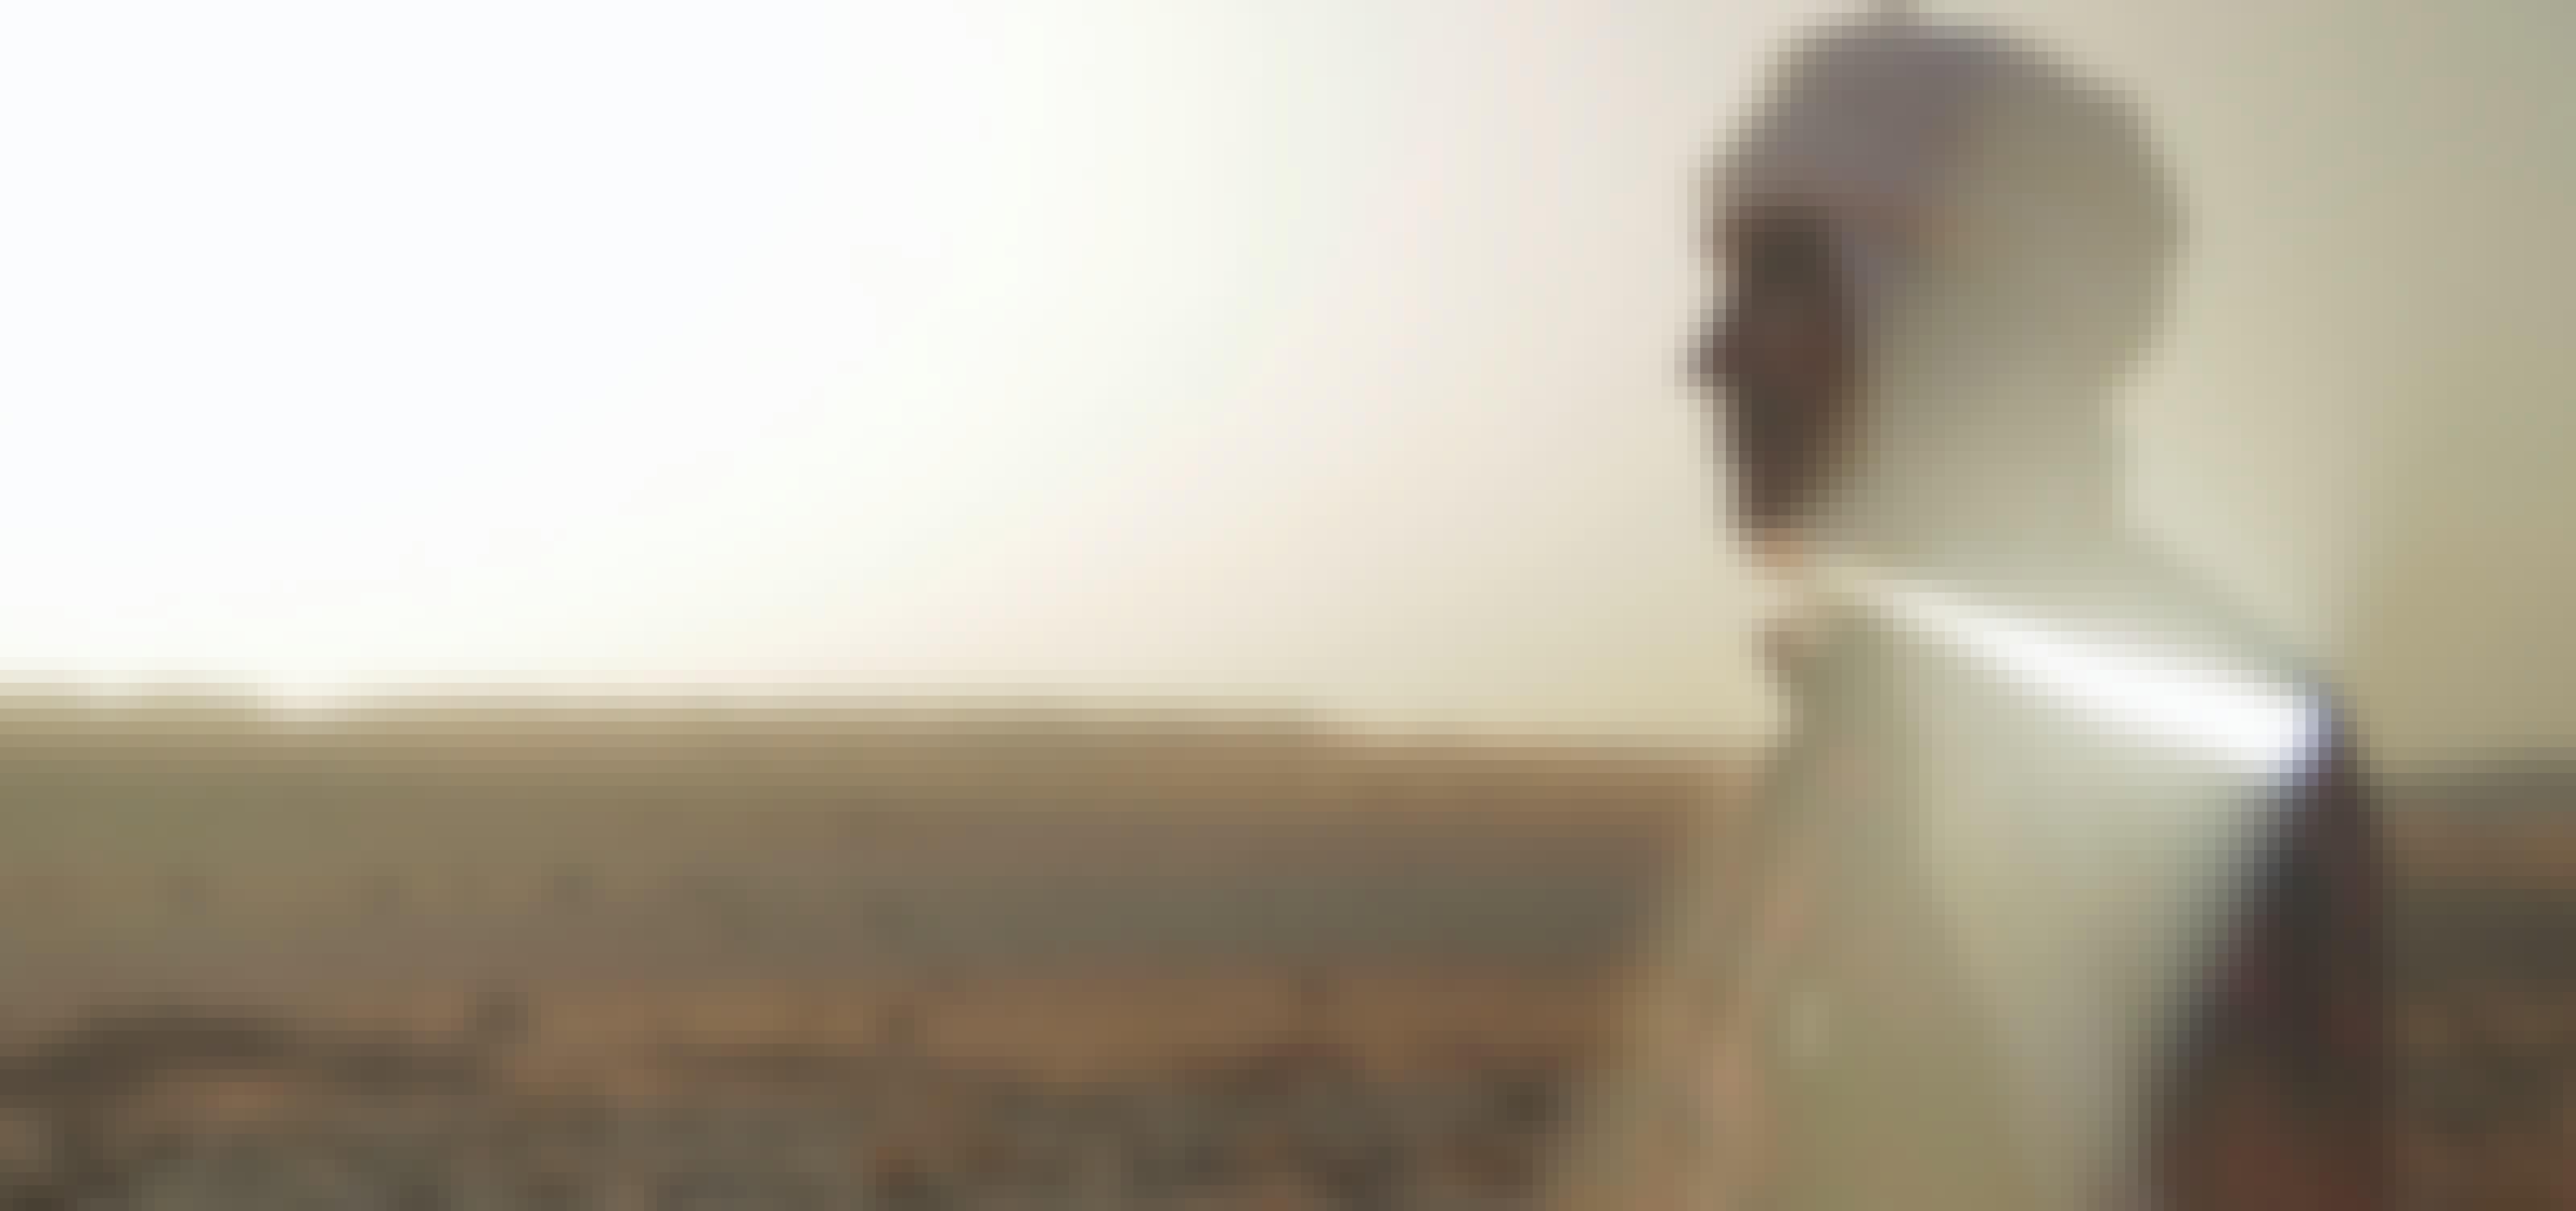 Ibn Battuta on the desert